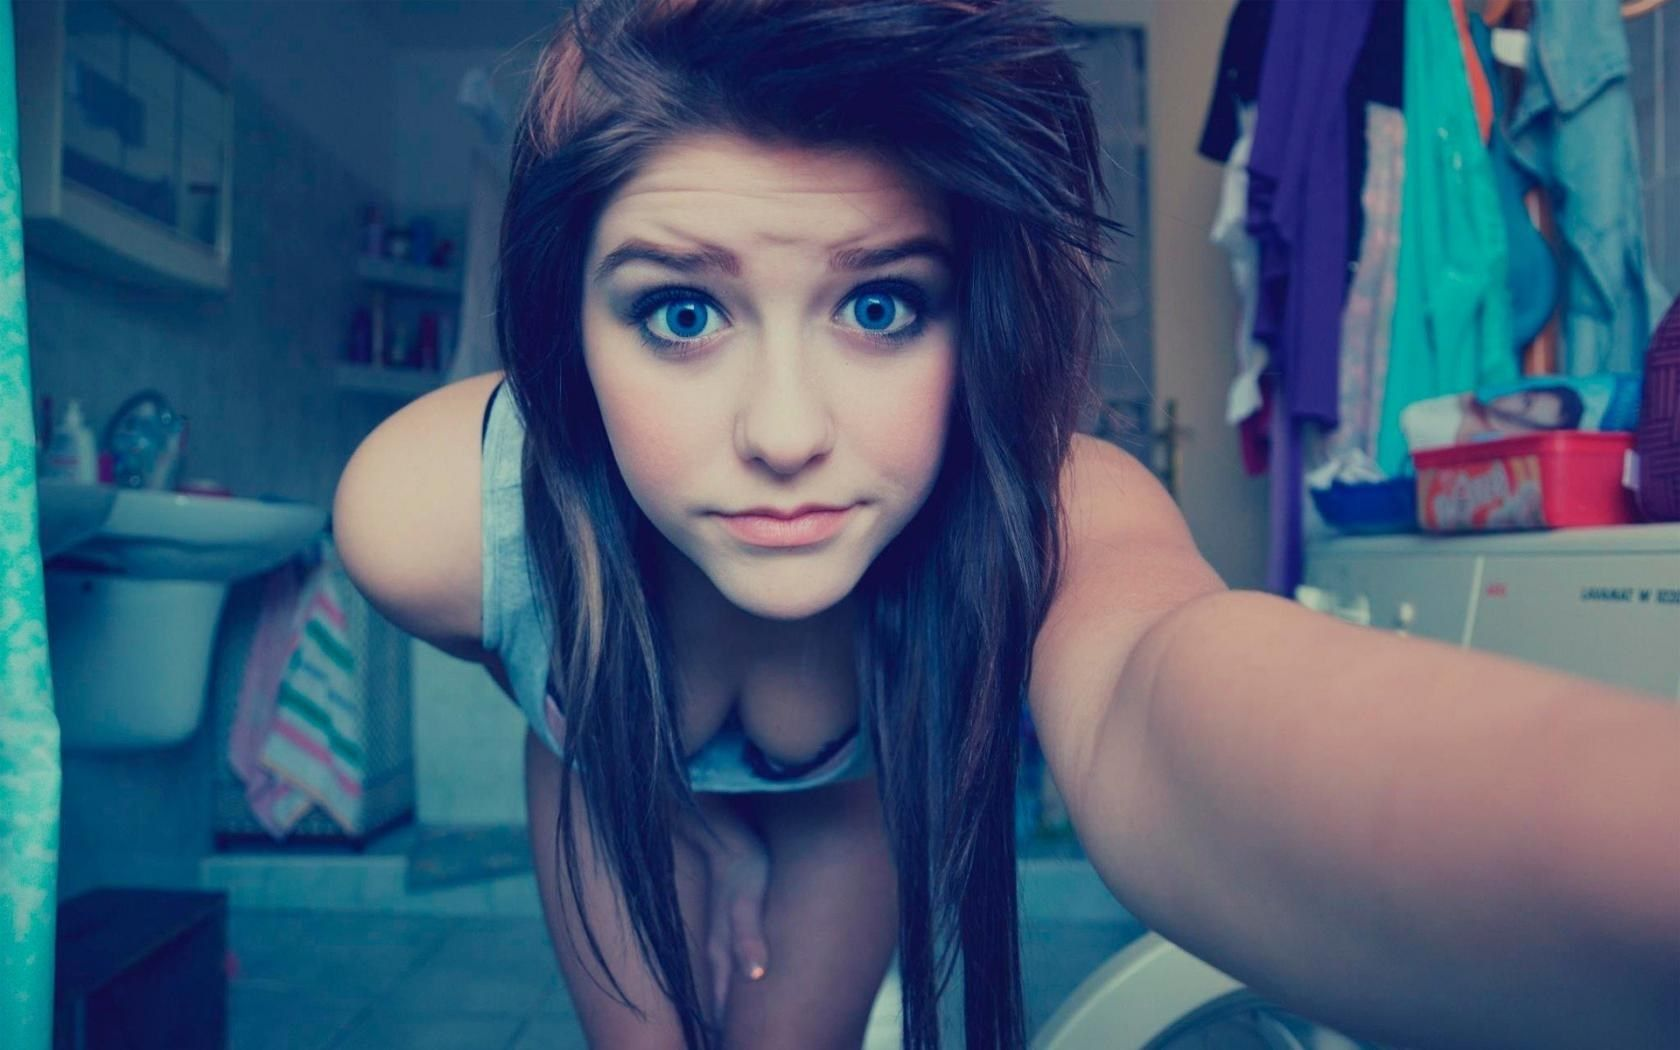 Bad girls on webcam — photo 13